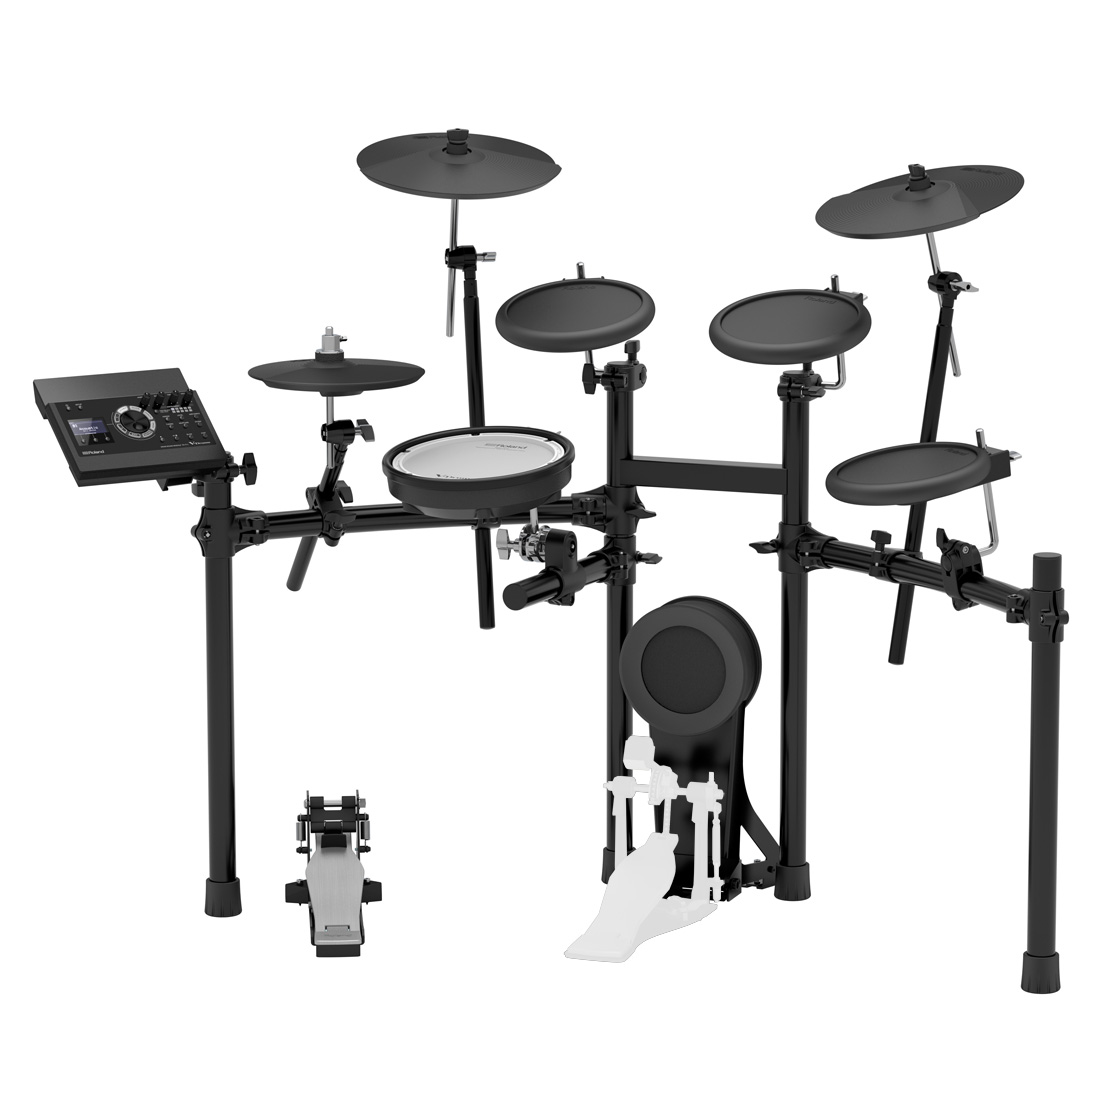 Roland / 電子ドラム TD-17K-L-S ローランド V-Drums Kit 【名古屋栄店】